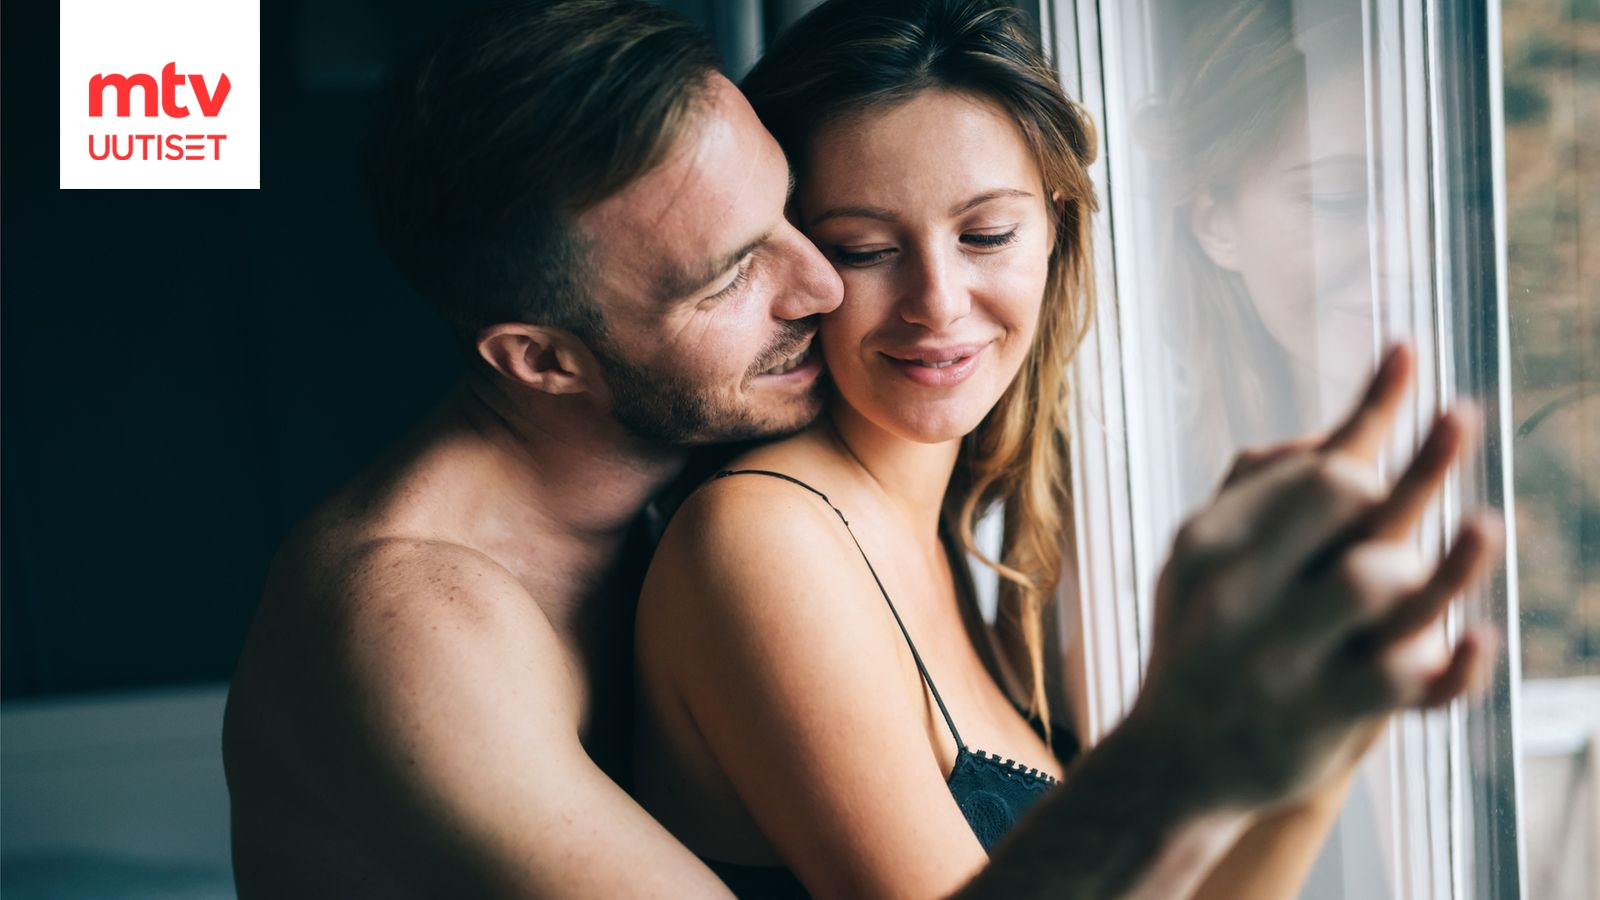 Tyttö vain dating App